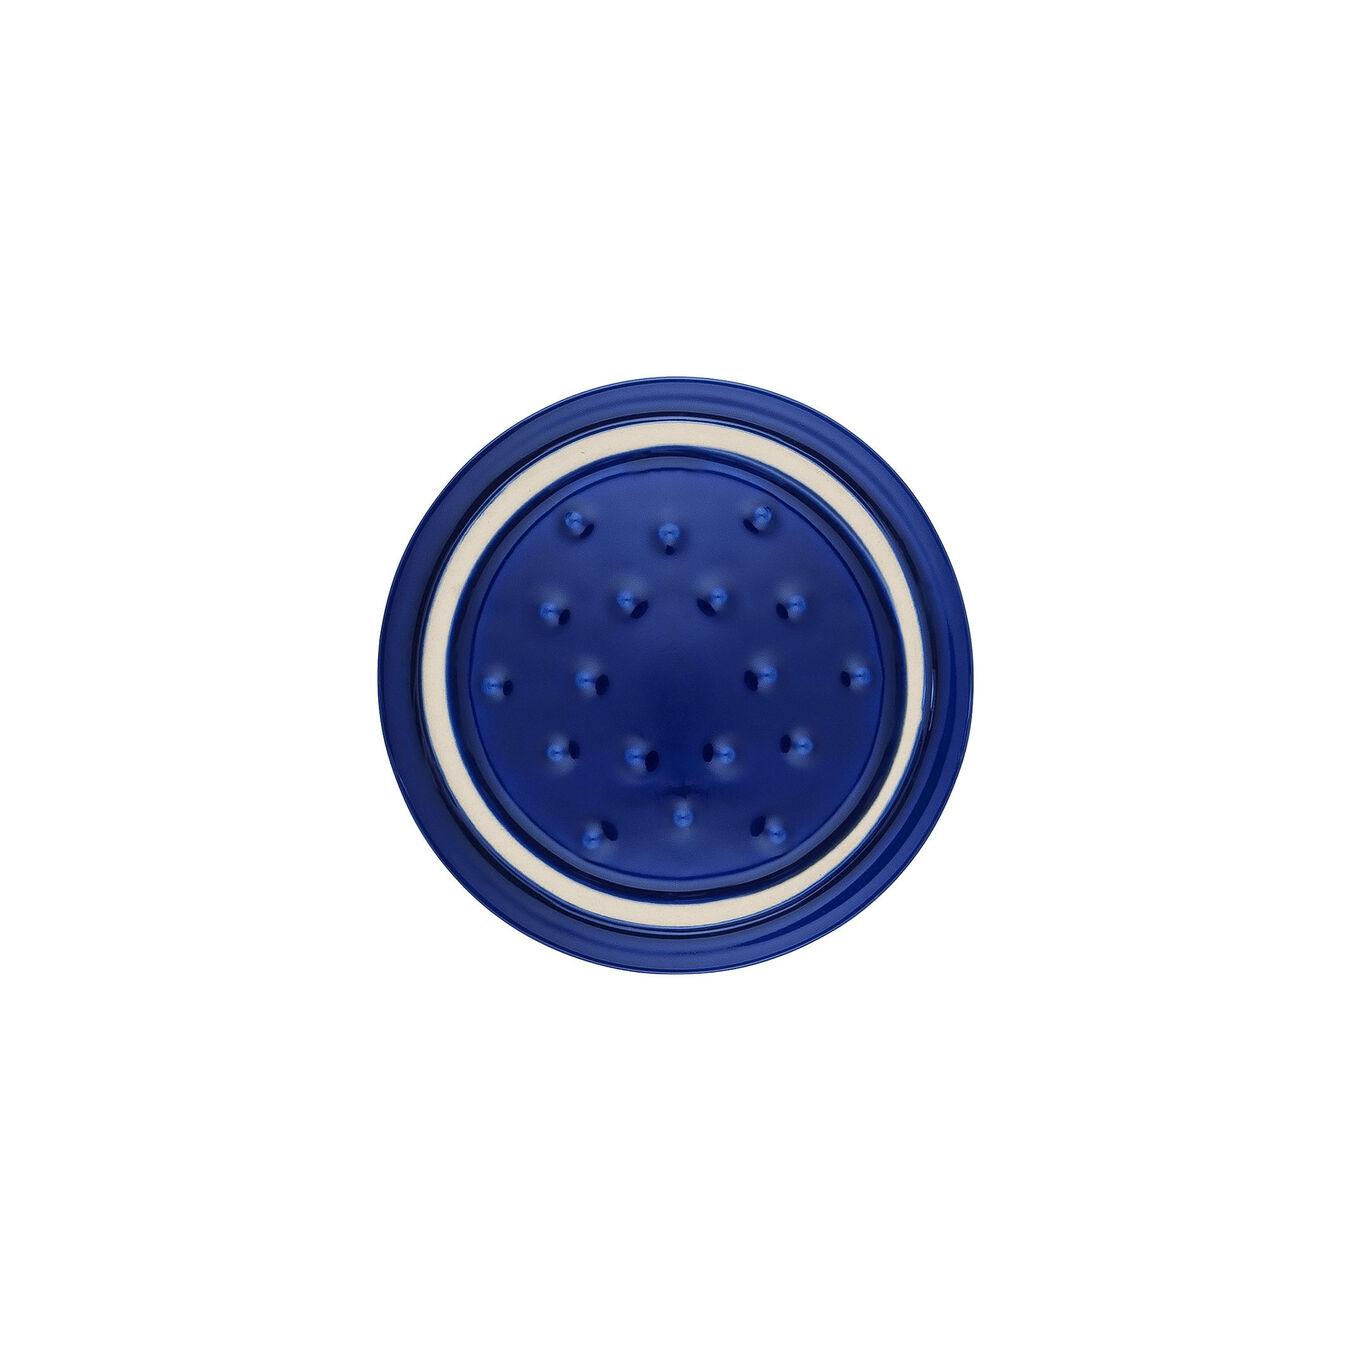 Minigryta 10 cm, Rund, Mörkblå, Keramiskt,,large 2